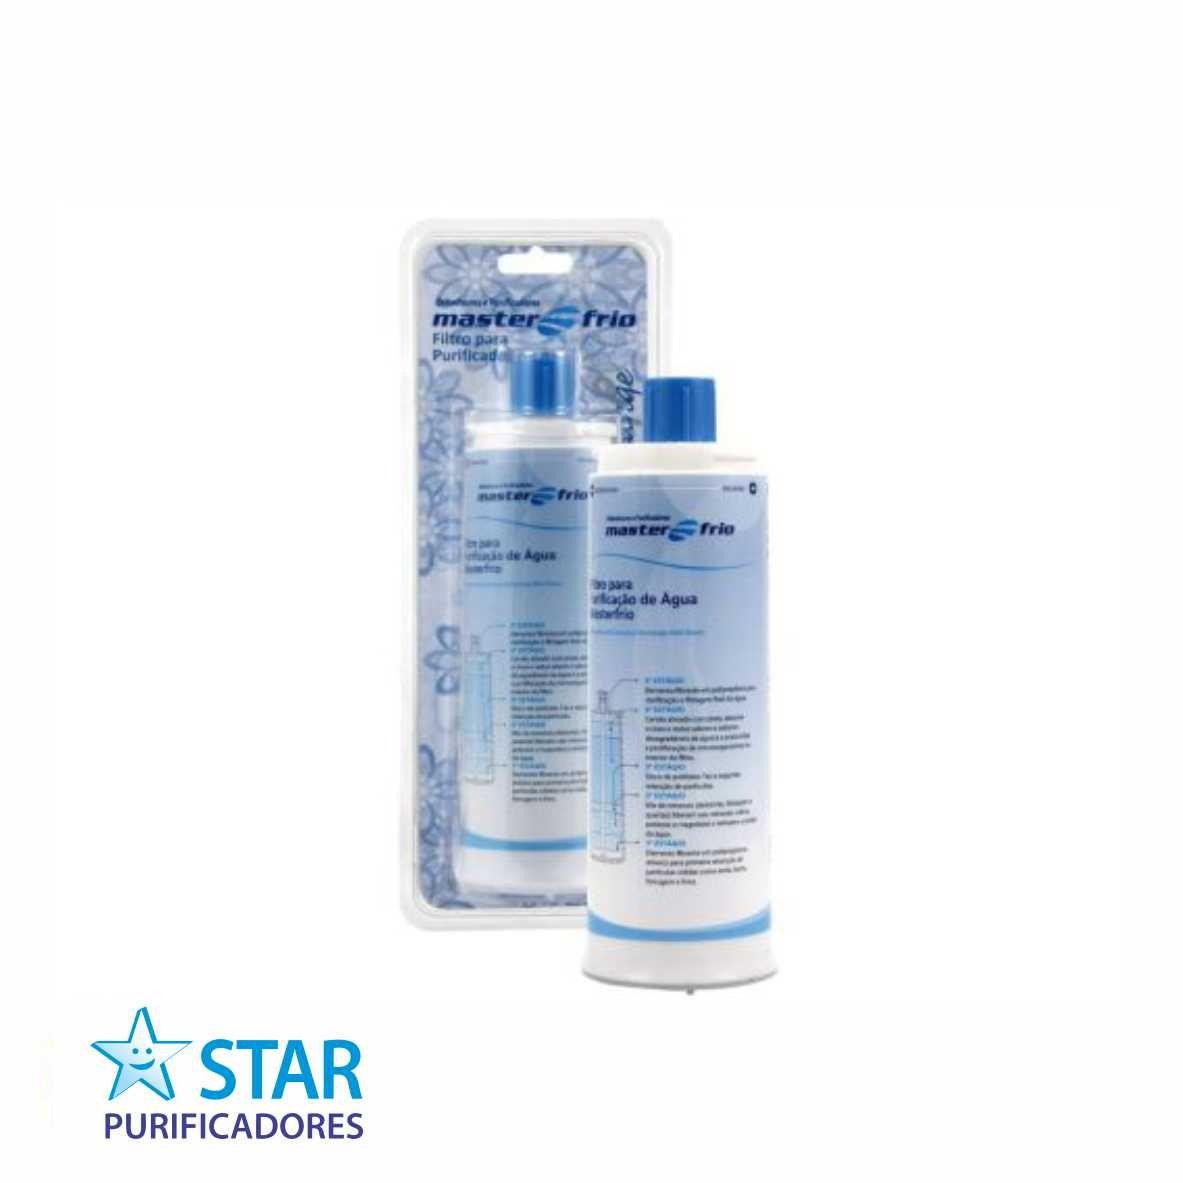 Filtro Masterfrio - Rótulo Azul  - Star Purificadores